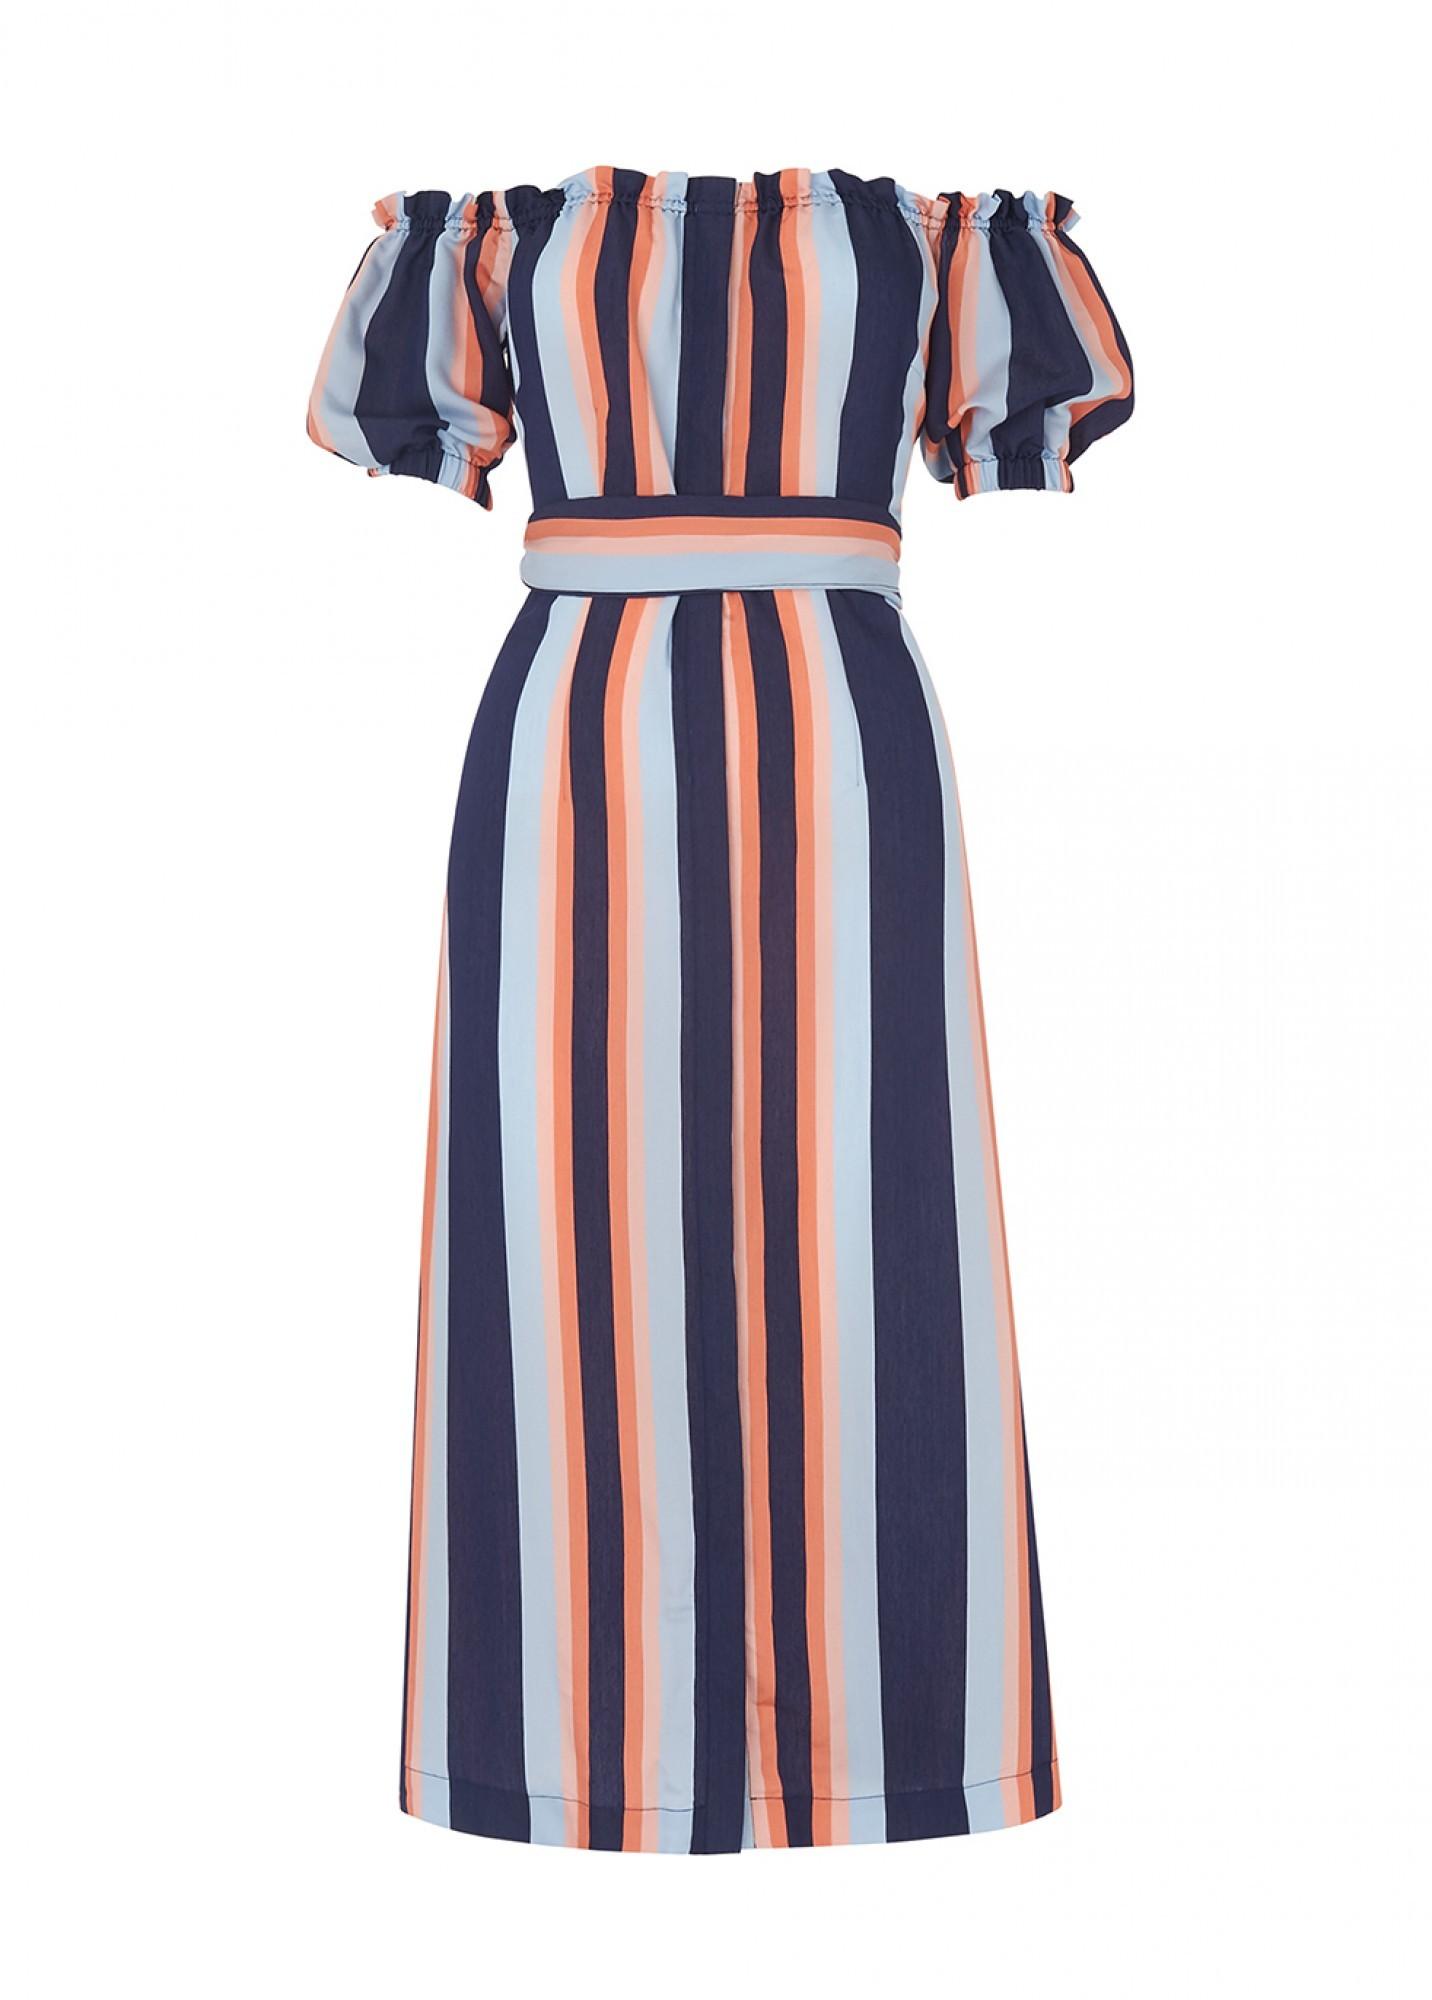 KITRI GLORIA STRIPED BARDOT DRESS